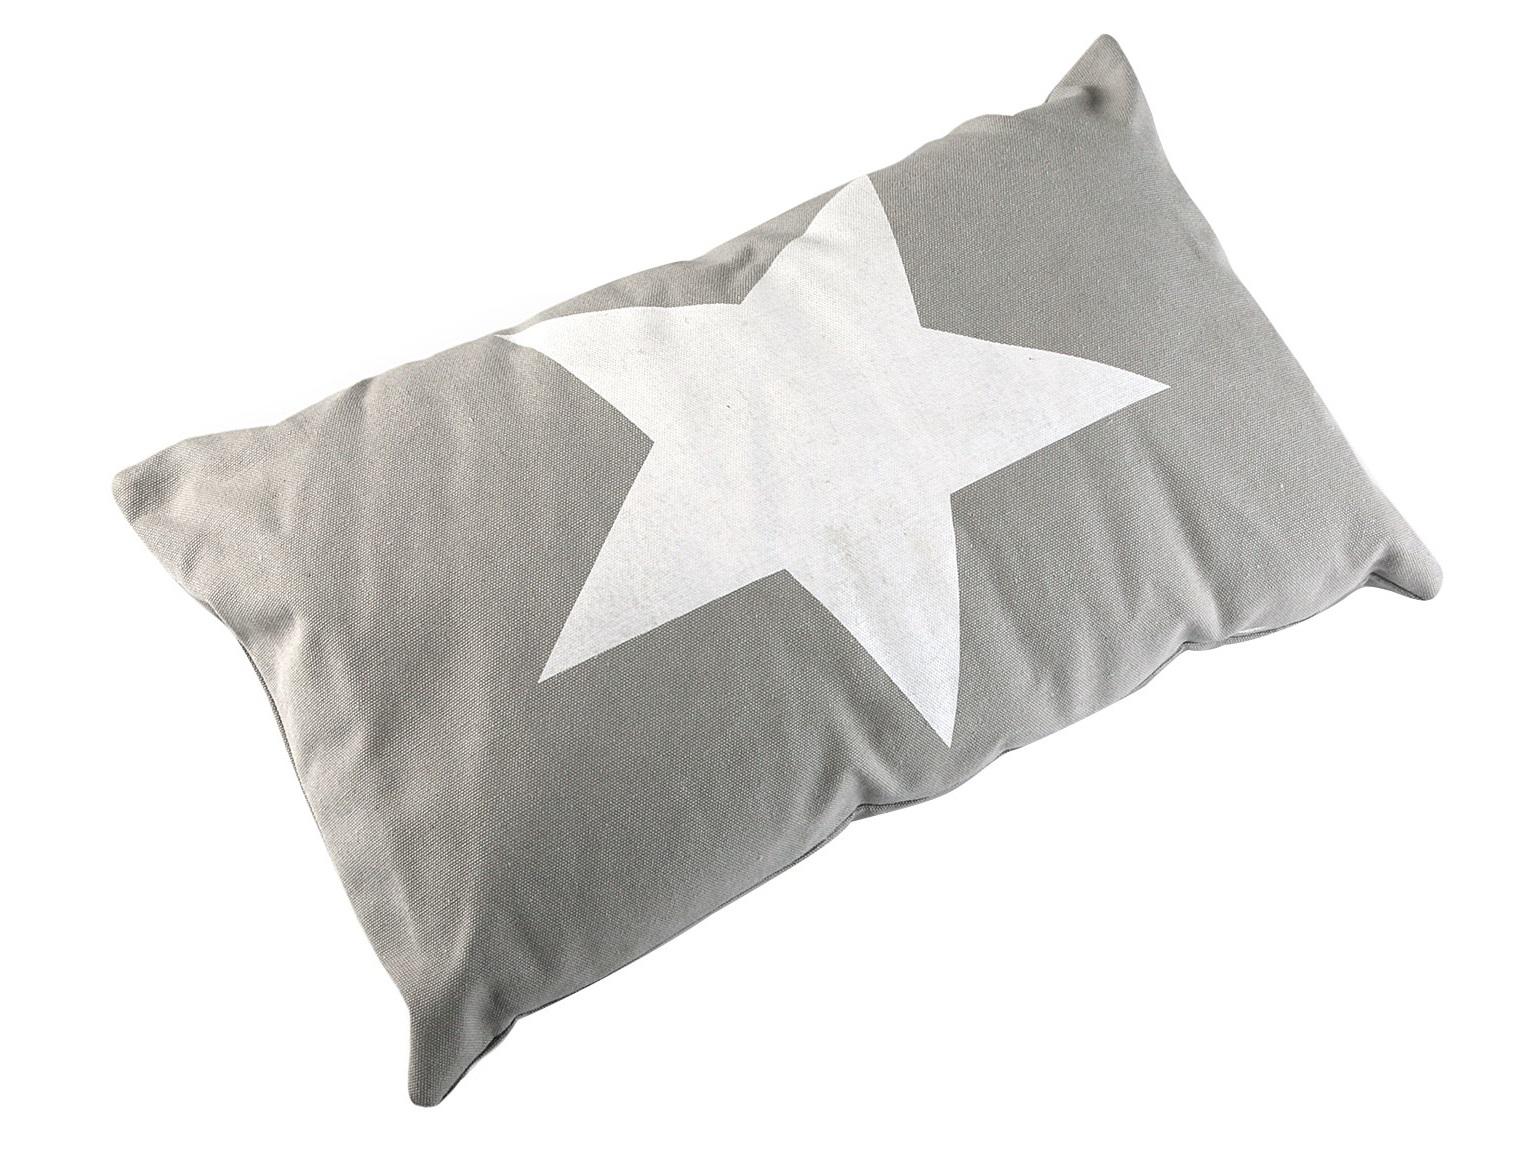 Подушка STARПрямоугольные подушки<br><br><br>Material: Хлопок<br>Length см: None<br>Width см: 50<br>Depth см: 30<br>Height см: 15